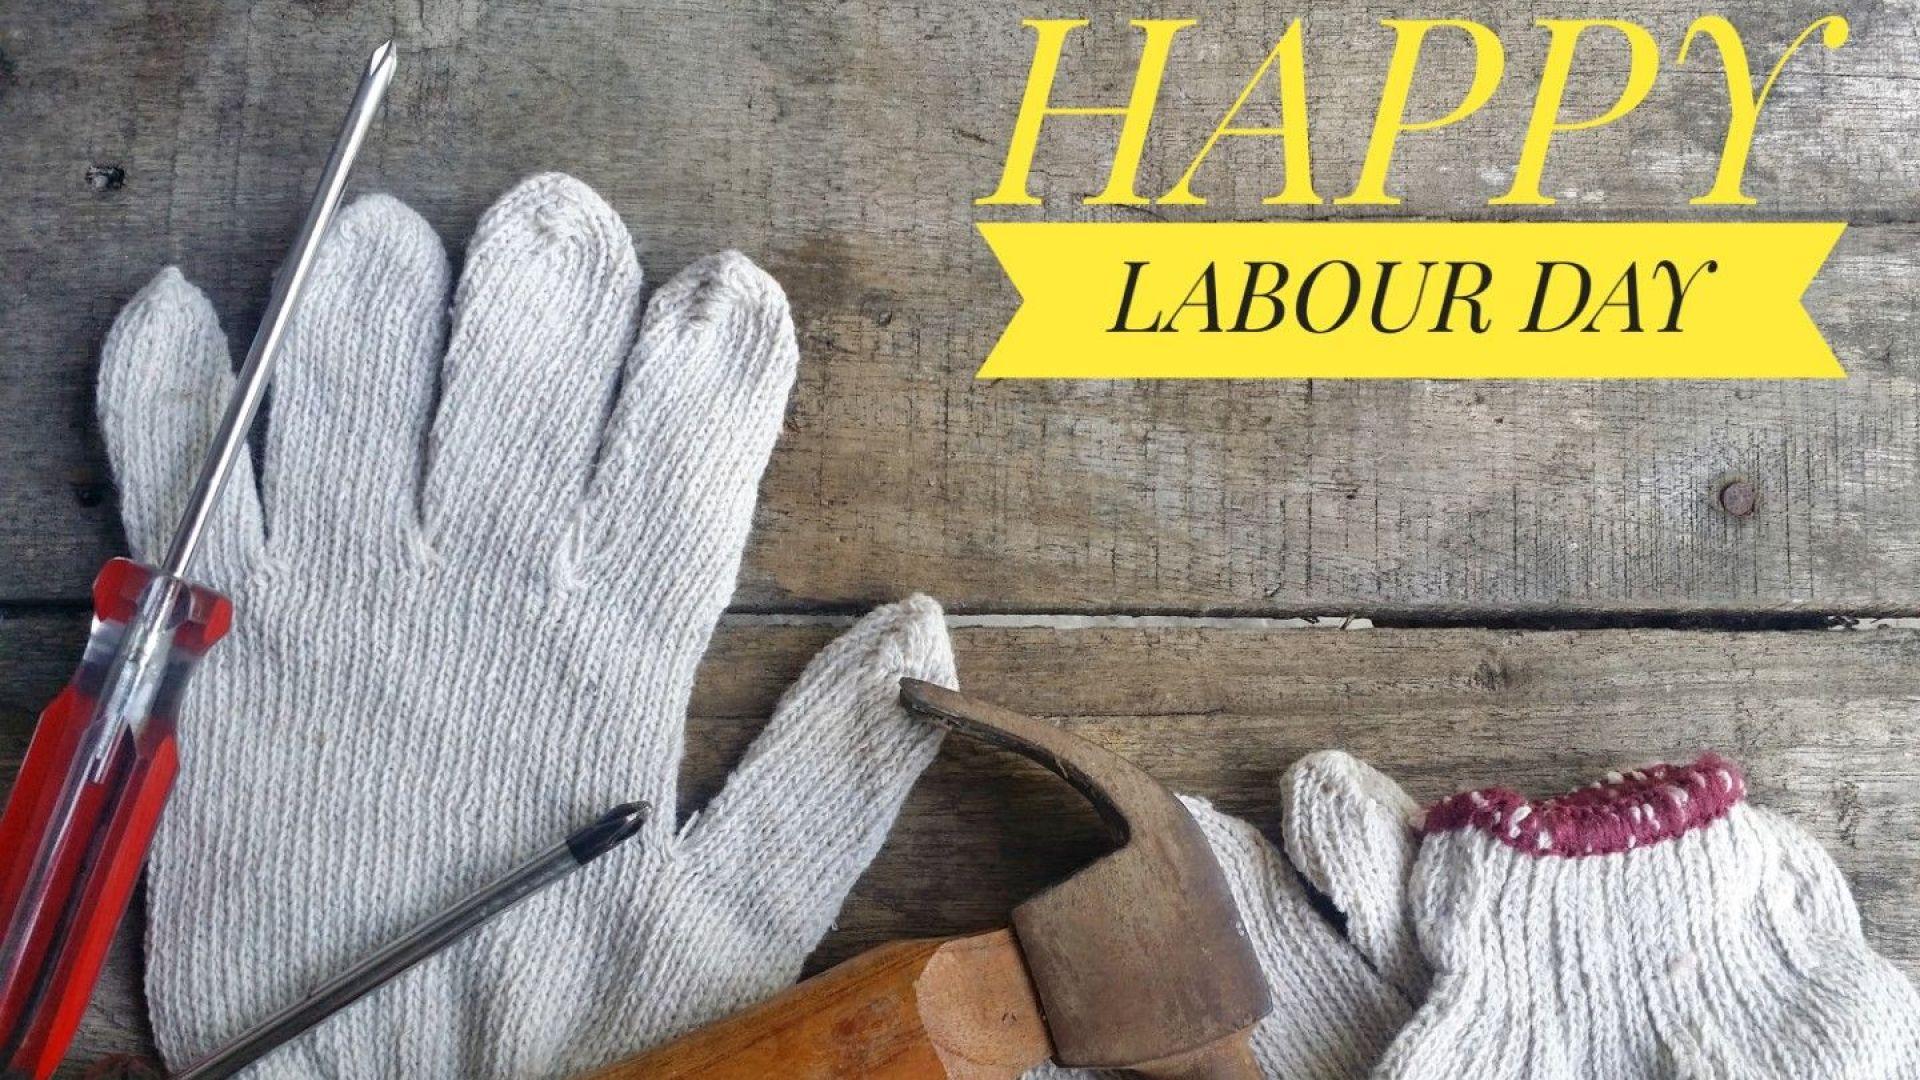 Честваме Деня на труда и работническата солидарност